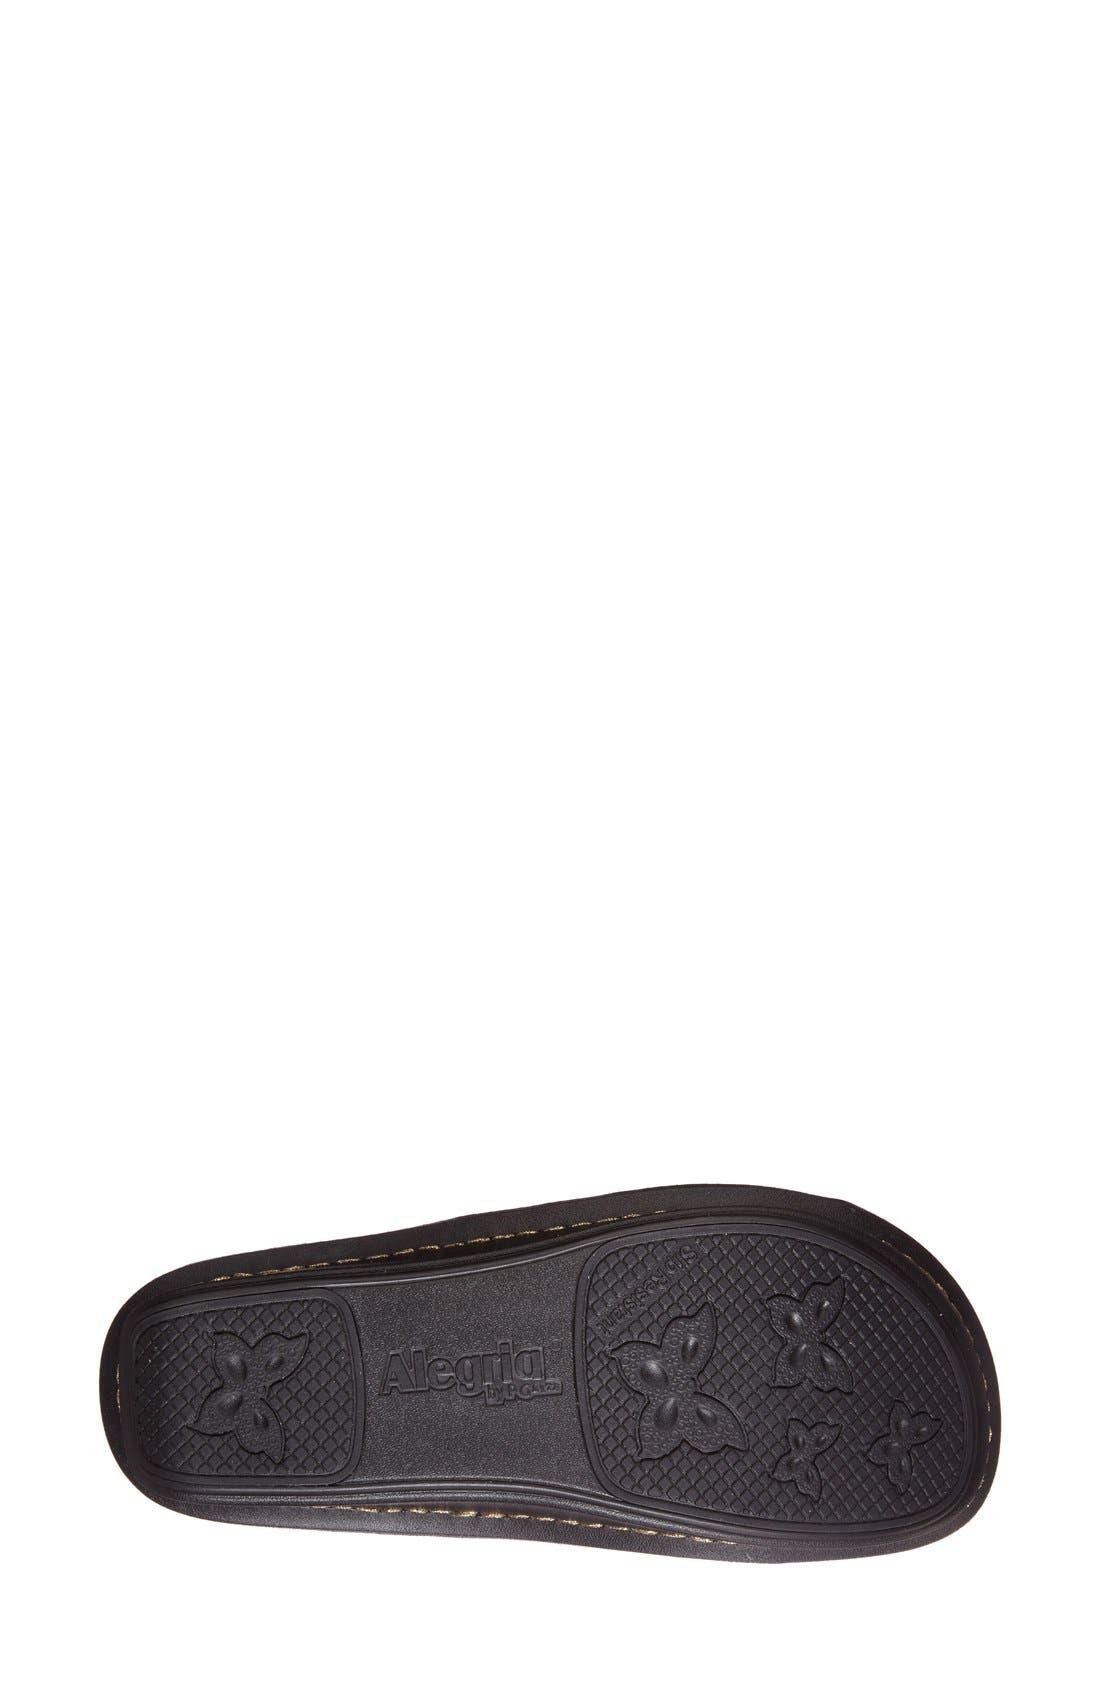 'Colette' Platform Sandal,                             Alternate thumbnail 51, color,